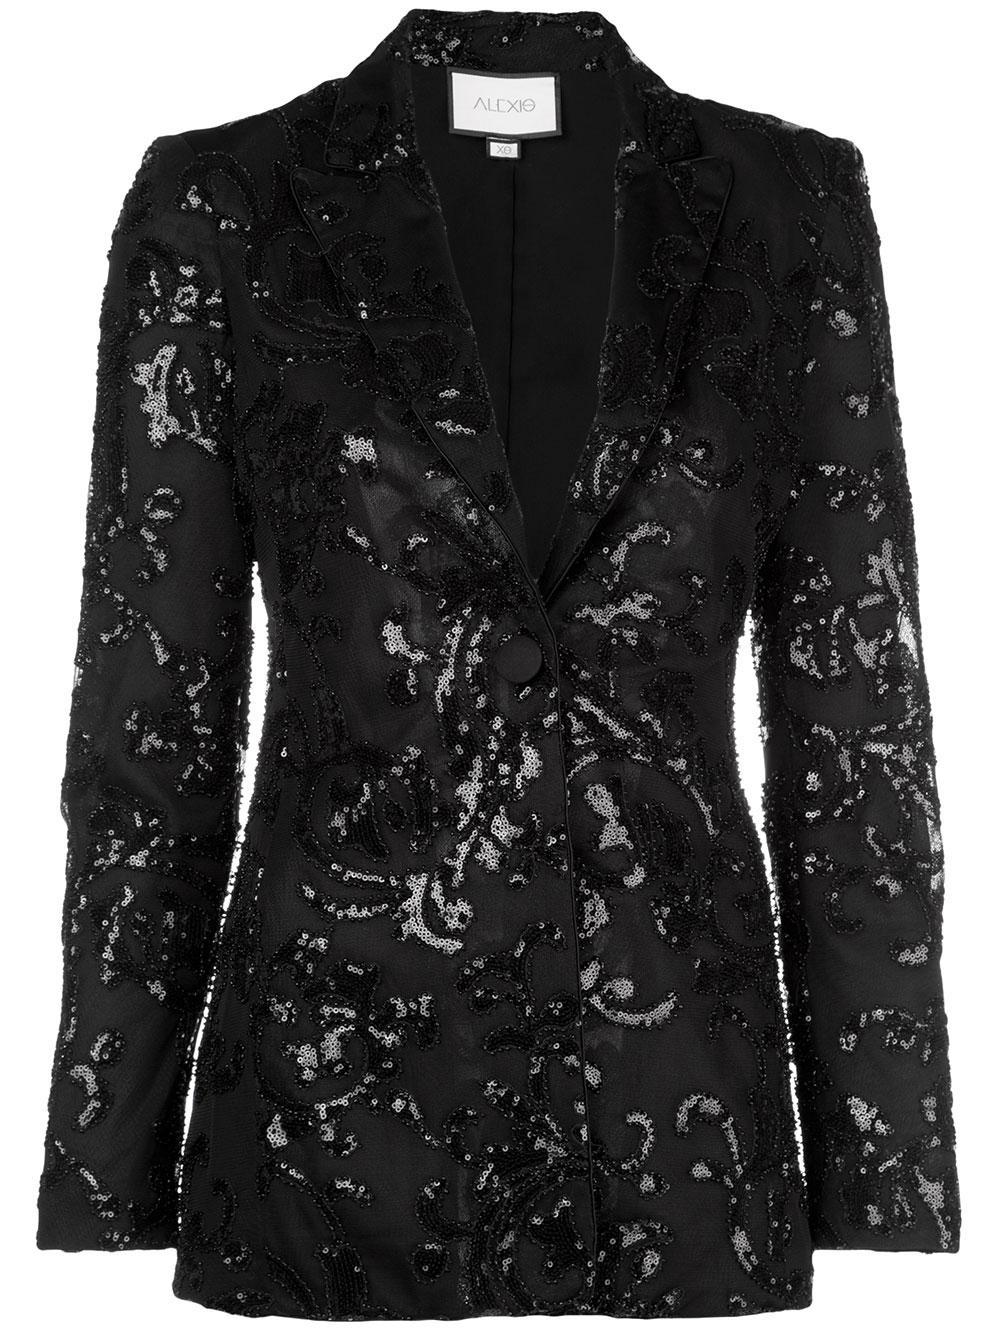 Firdas Beaded Jacquard Suit Blazer Item # A41905155823